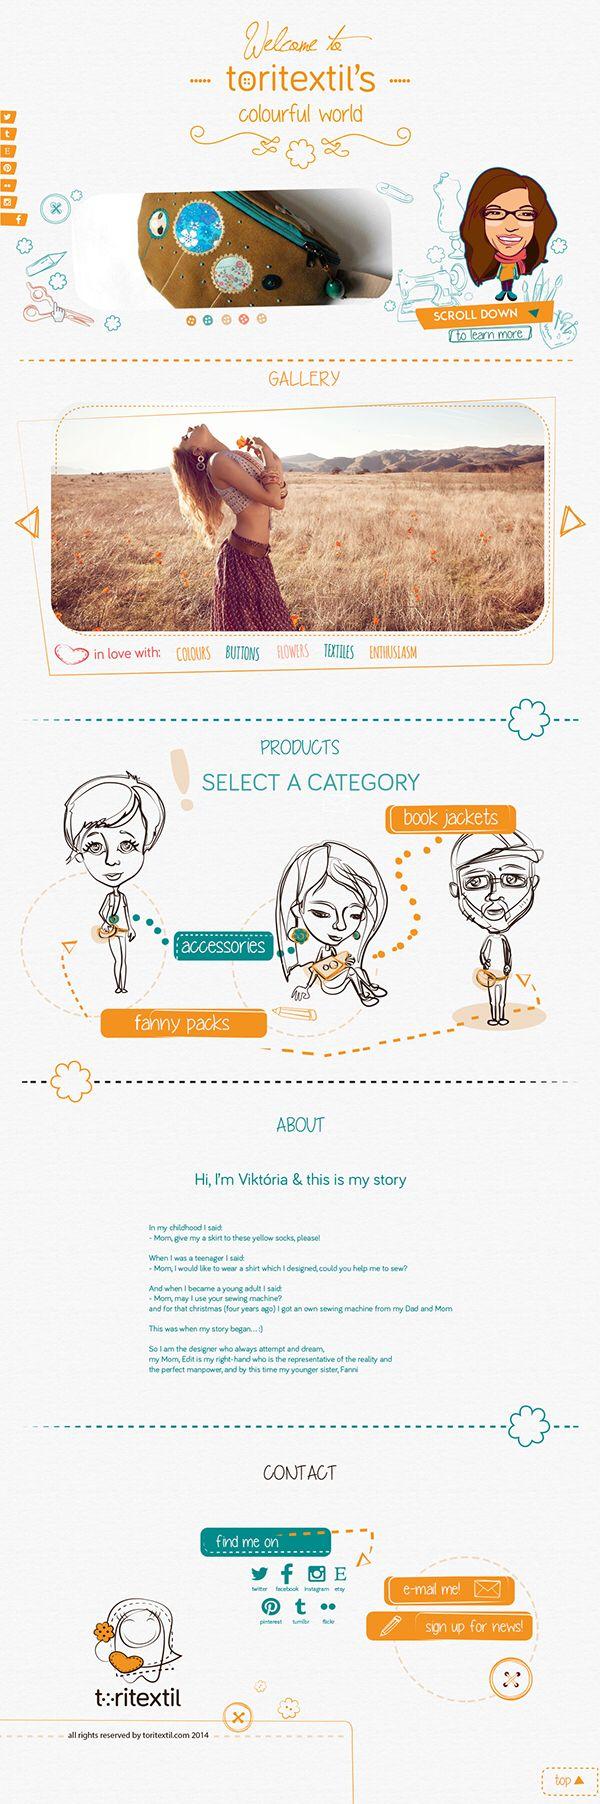 webdesign for my fanny packs by @csengerieszter  #webdesign #behance #handdrawn #fannypack #bumbag #hipbag #sewing #friends #designer